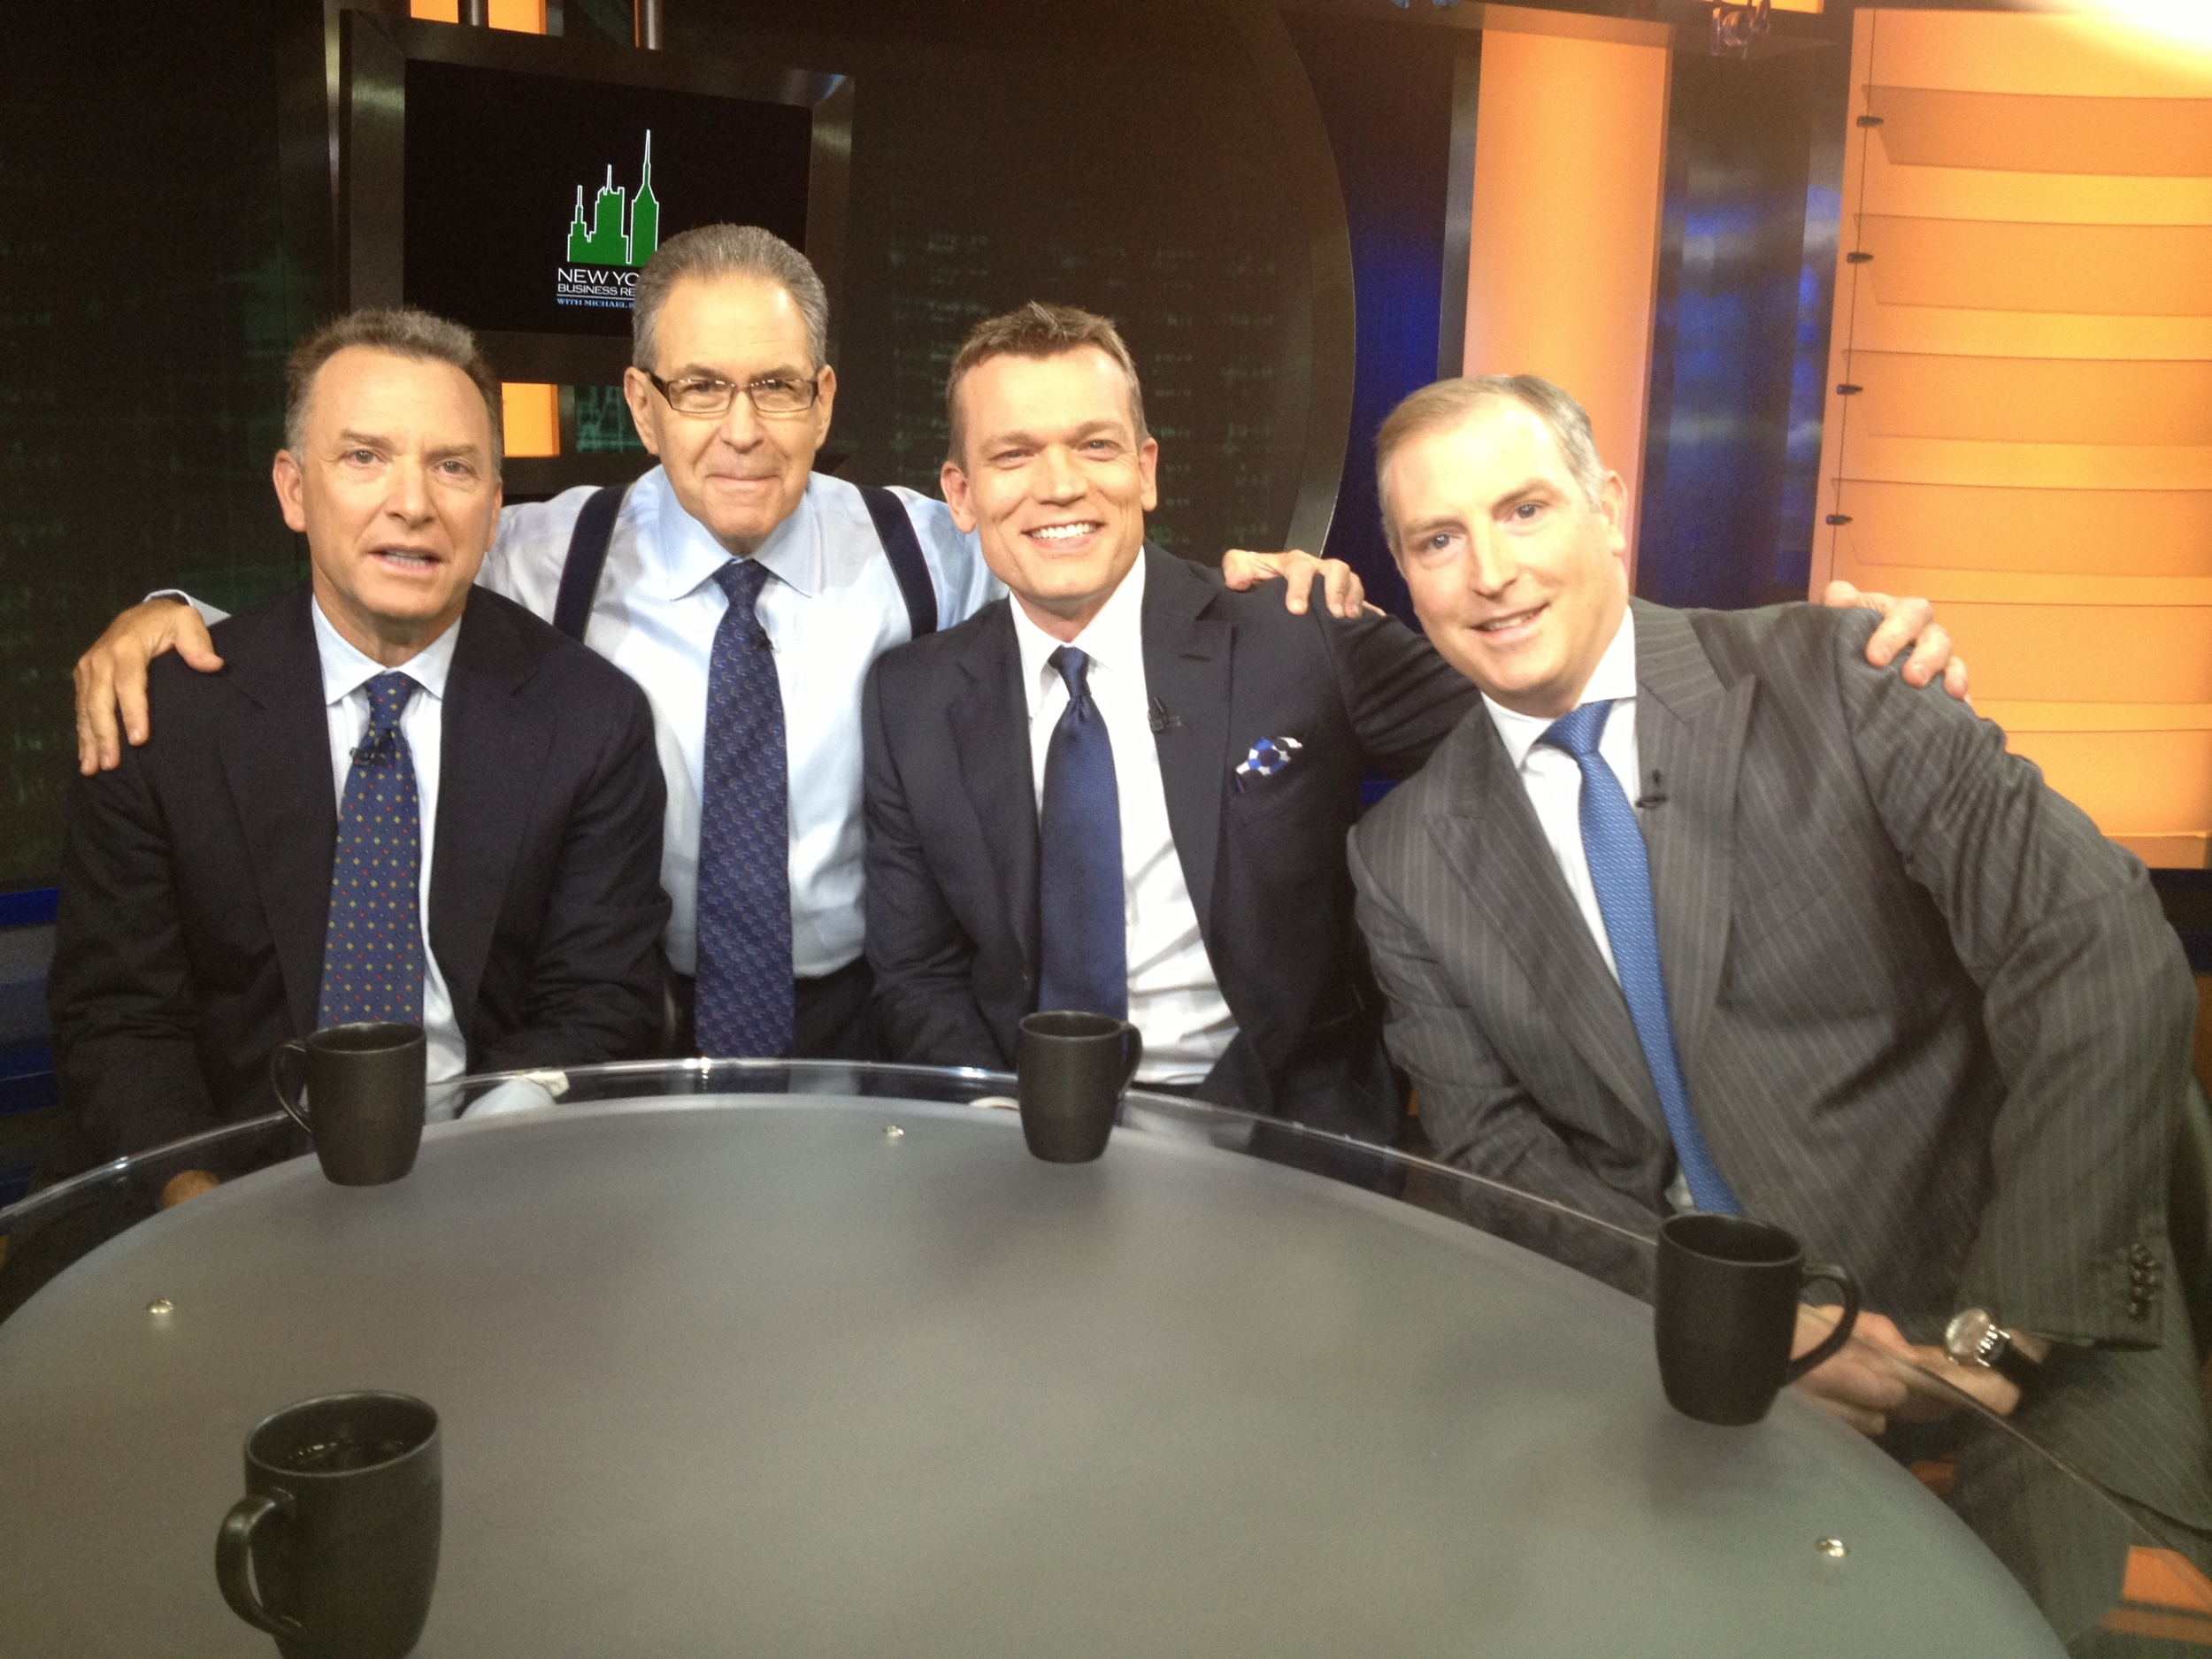 Steve Witkoff, Joe McMillan, Peter D'Arcy